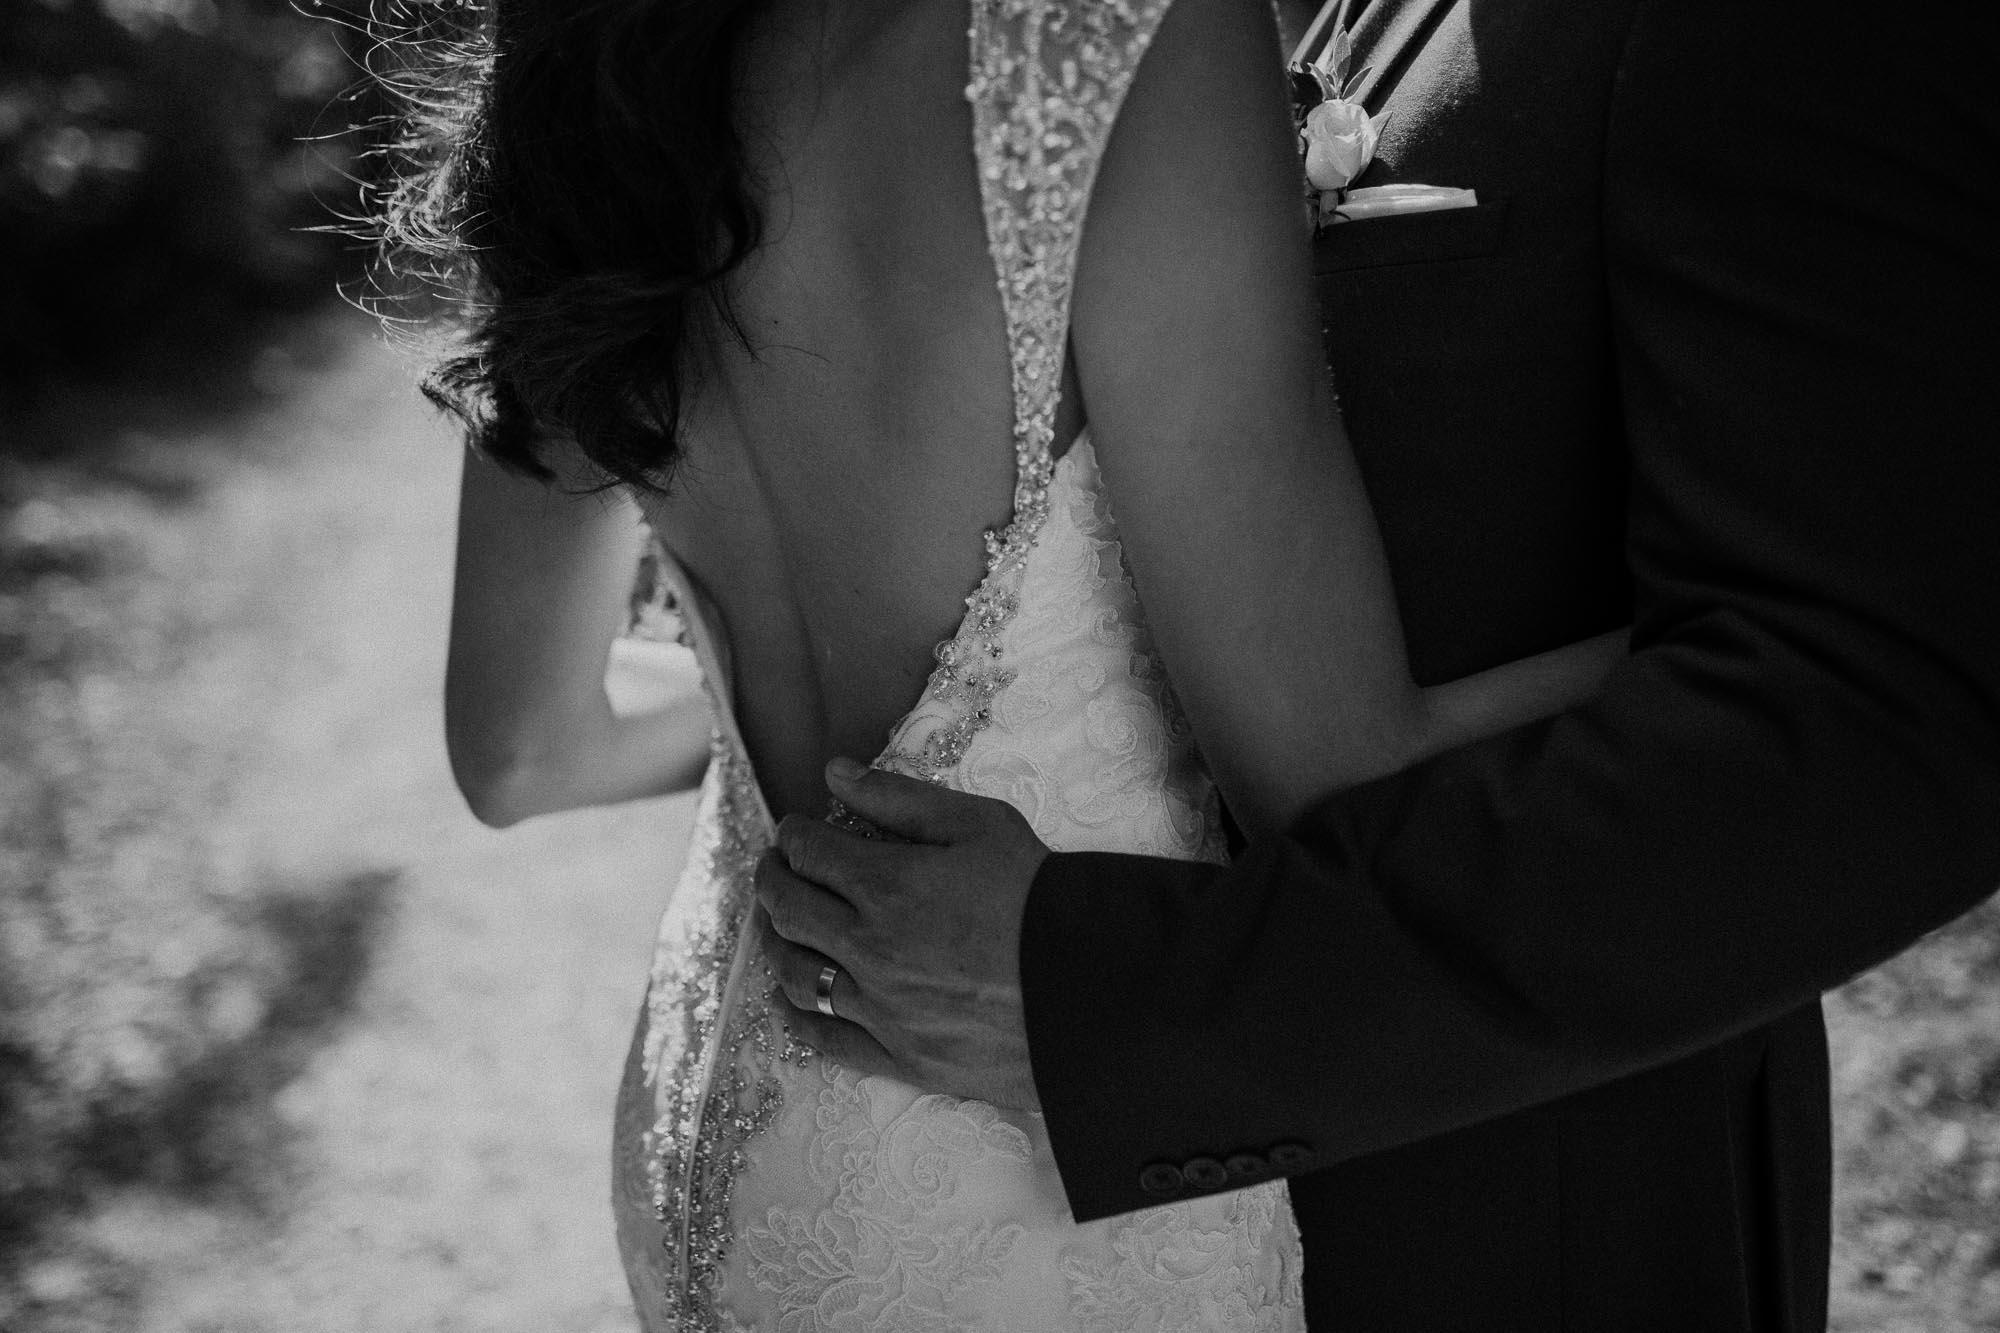 champaign_il_wedding_photography-0367.jpg